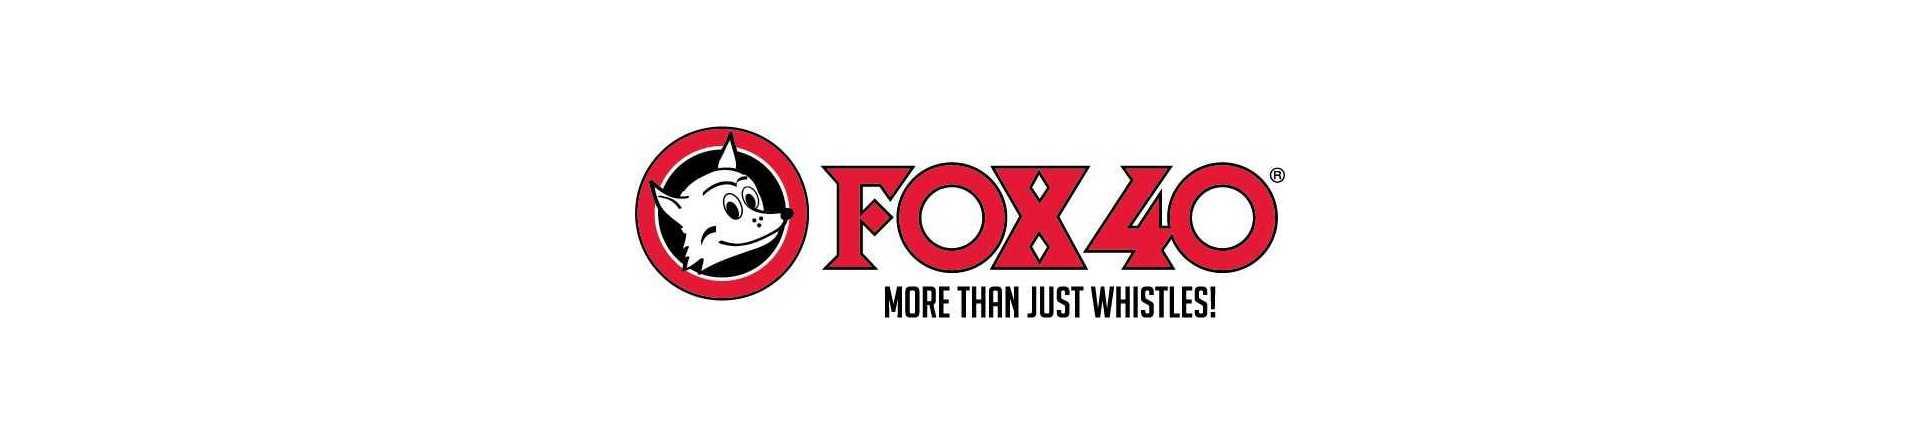 Fischietti Fingergrip FOX 40